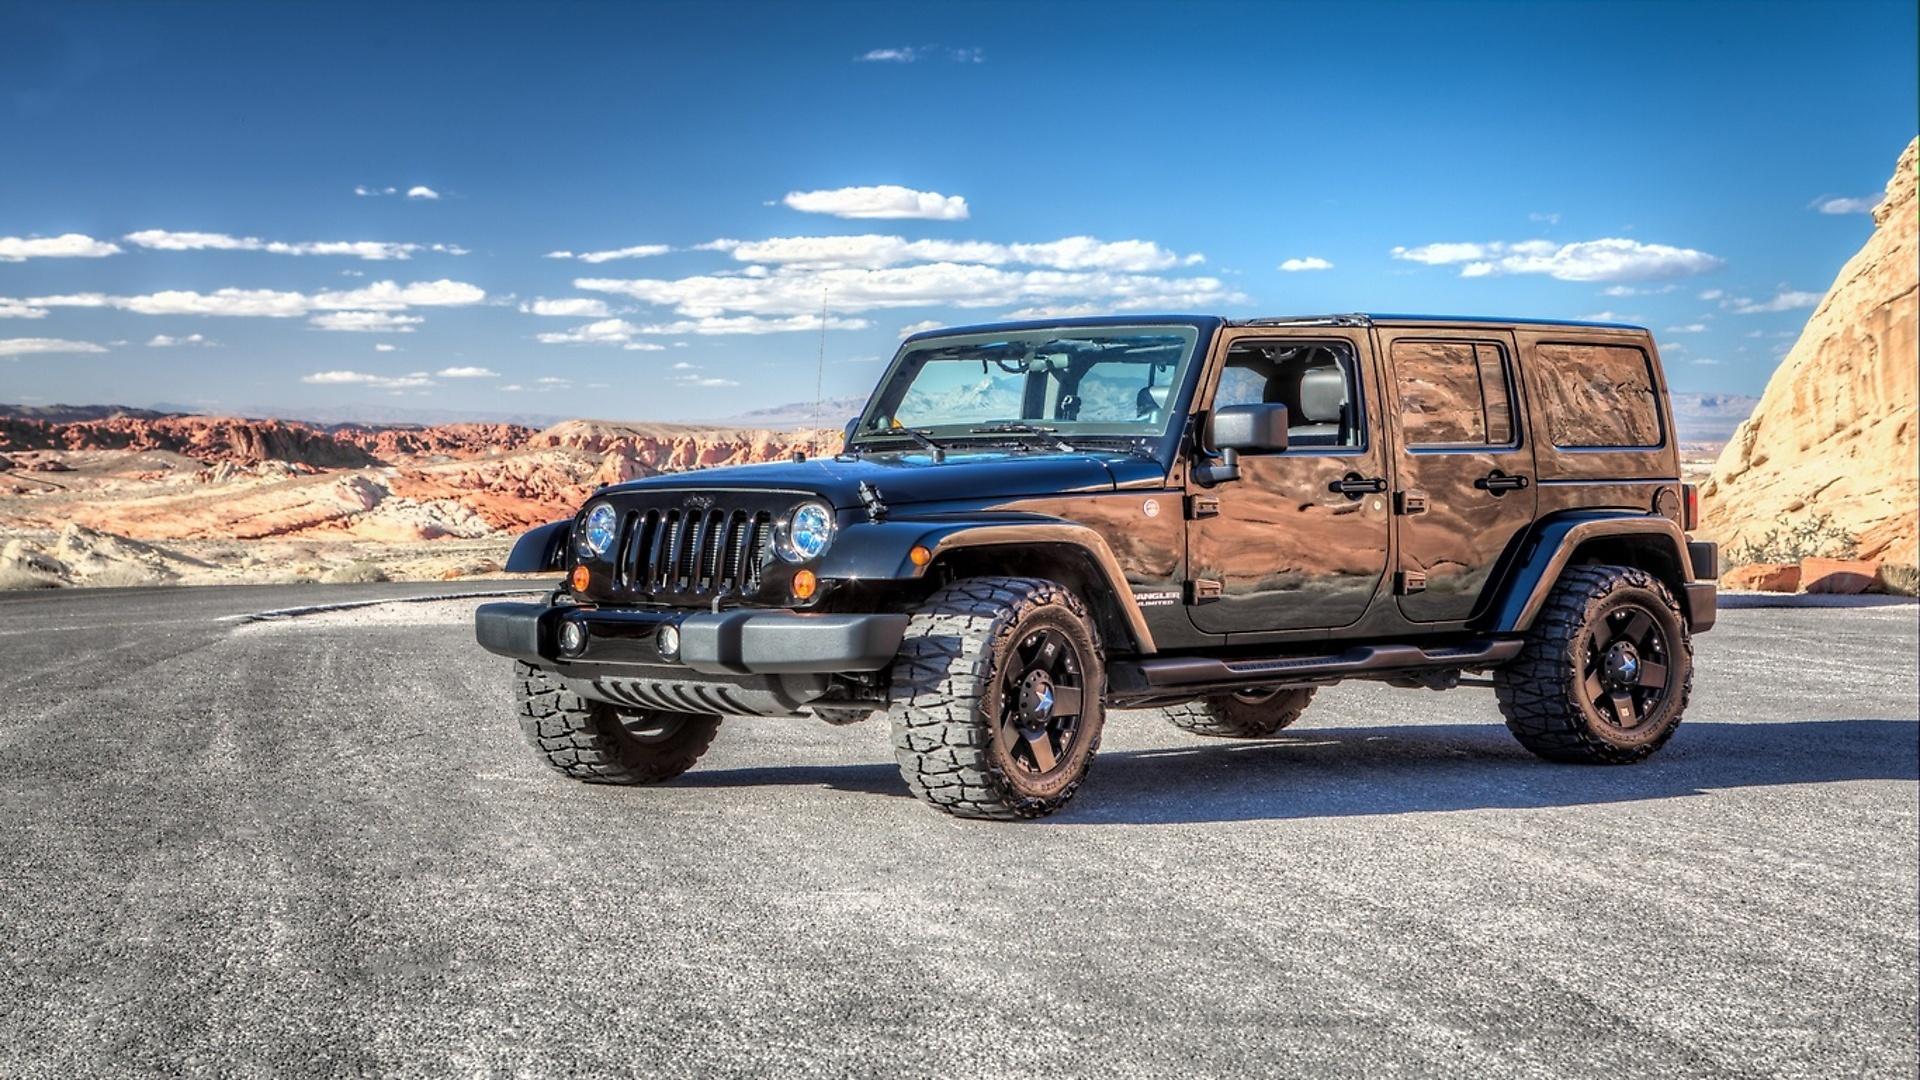 Внедорожник jeep в пустыне онлайн